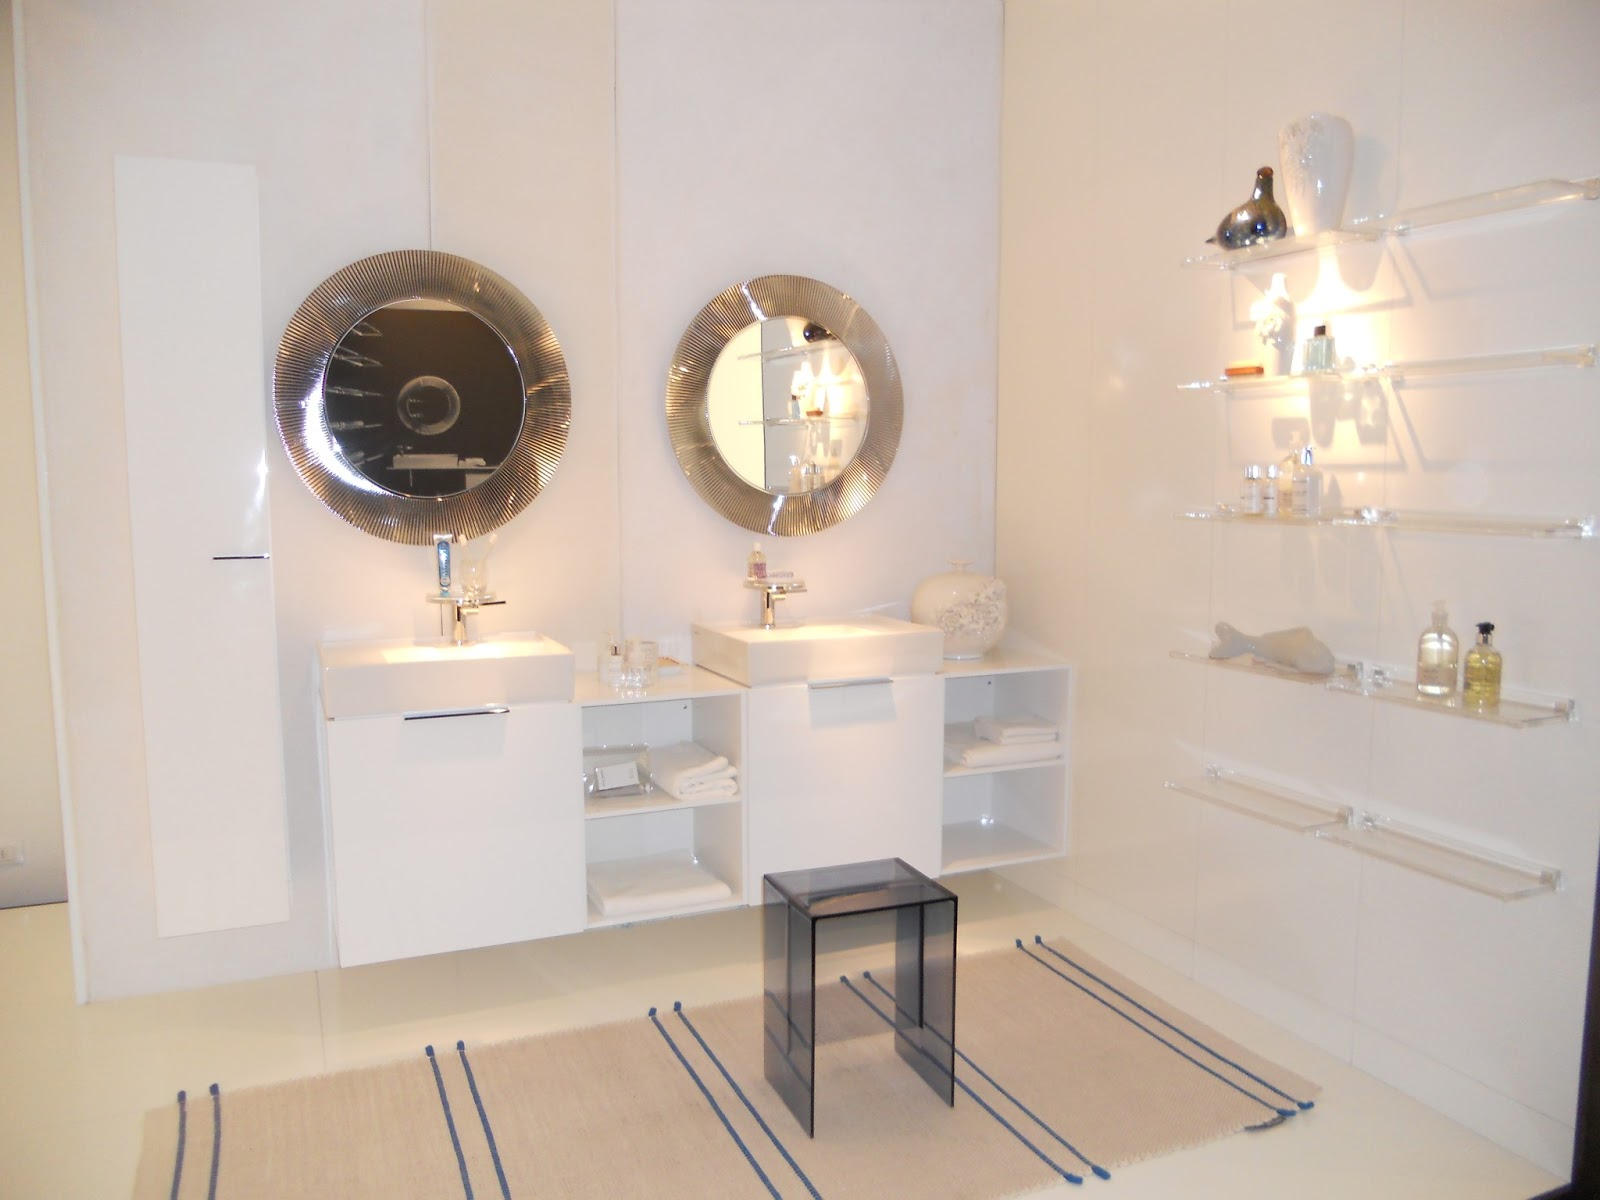 Milan Design Week: Salone del Mobile Day 1, Centro | ZUVALifeCulture